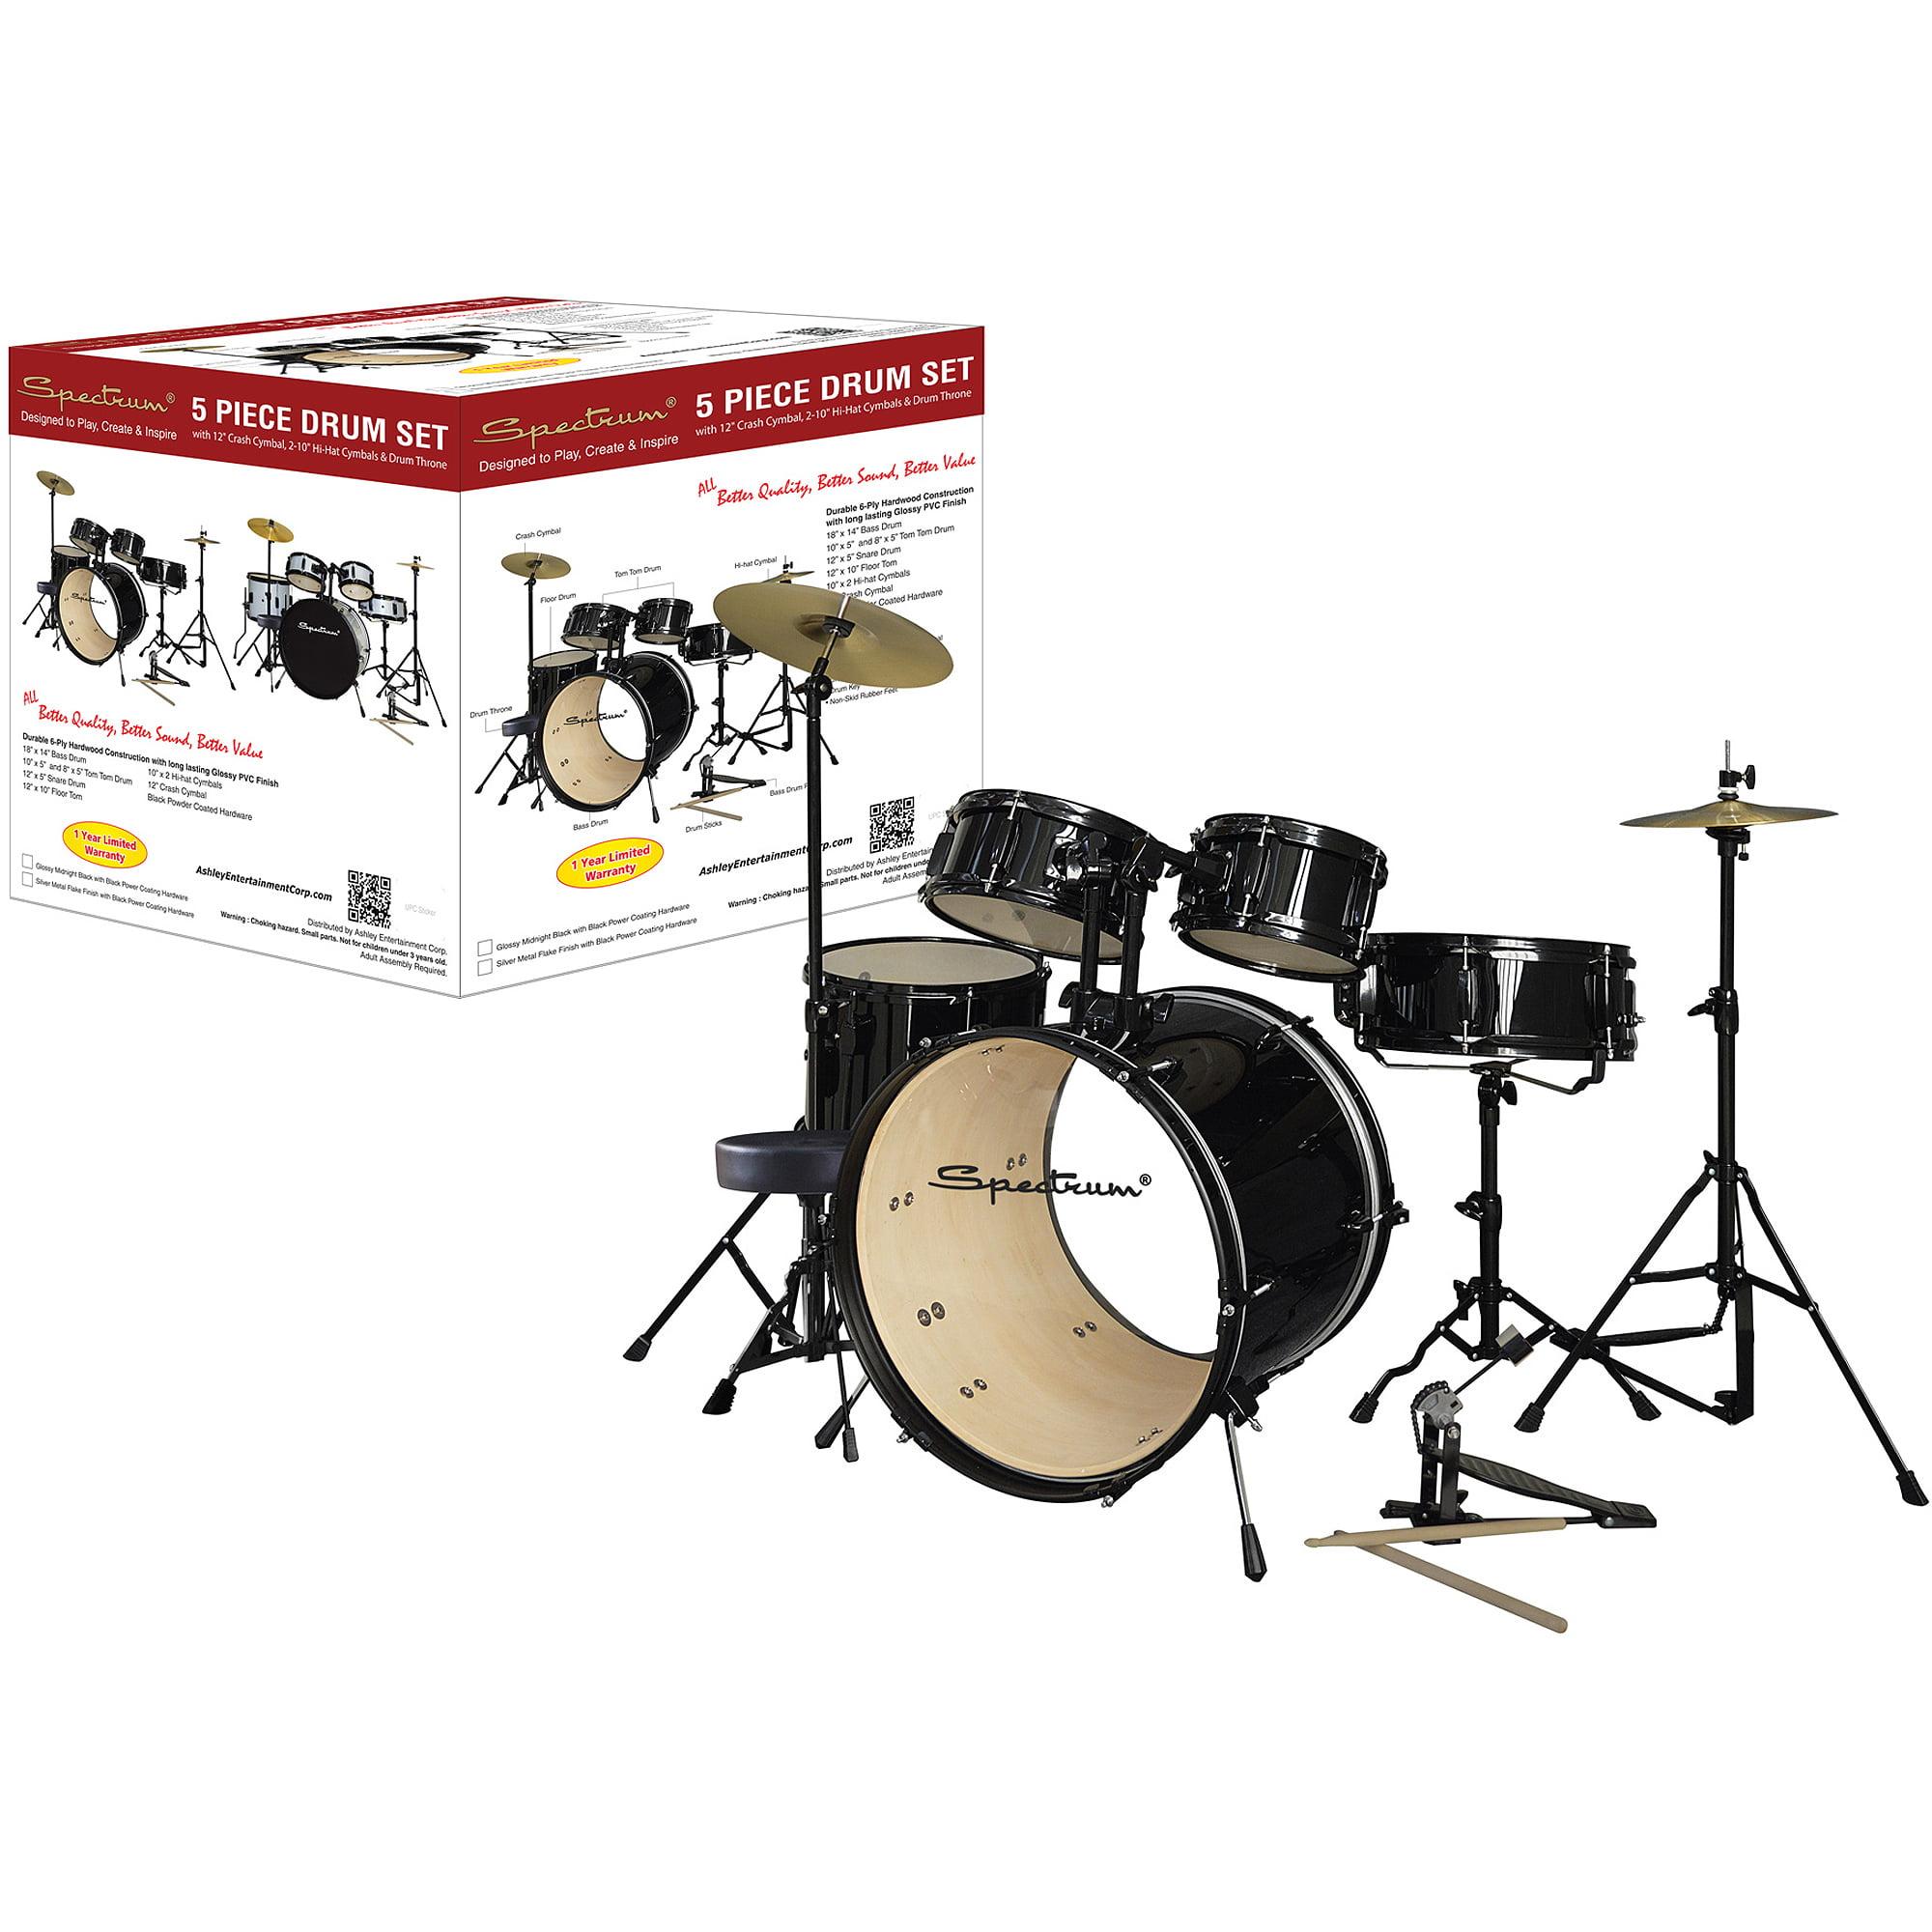 Spectrum AIL 672BK 5-Piece Complete Drum Set with Bonus 250-Pound Capacity Drum Stool, Black